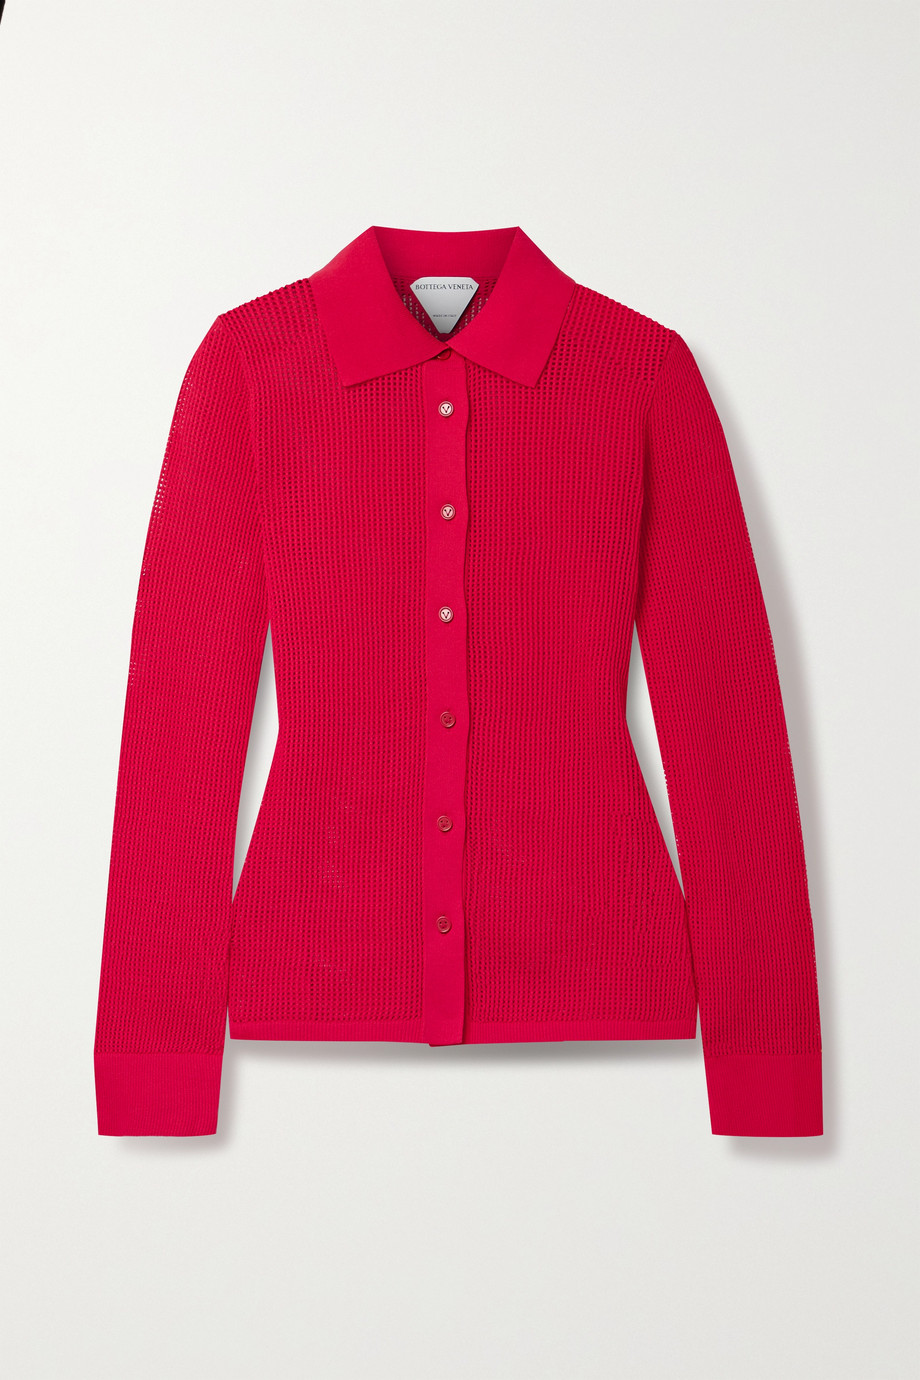 Bottega Veneta Open-knit shirt